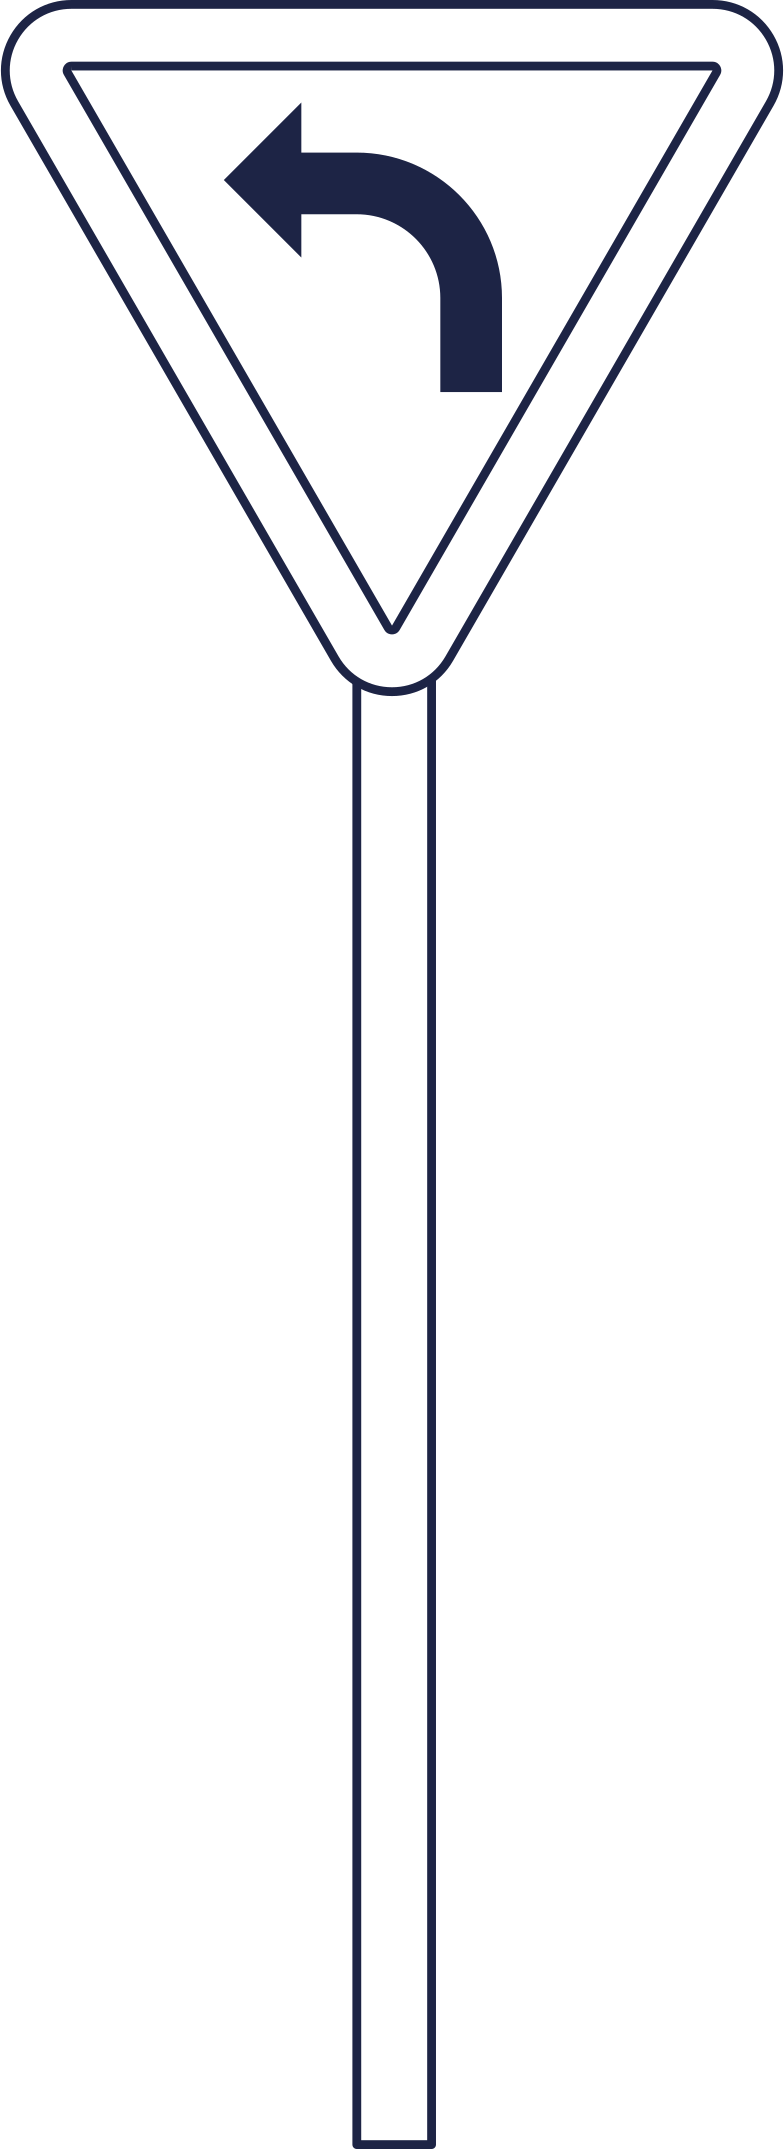 traffic sign Clipart illustration in PNG, SVG